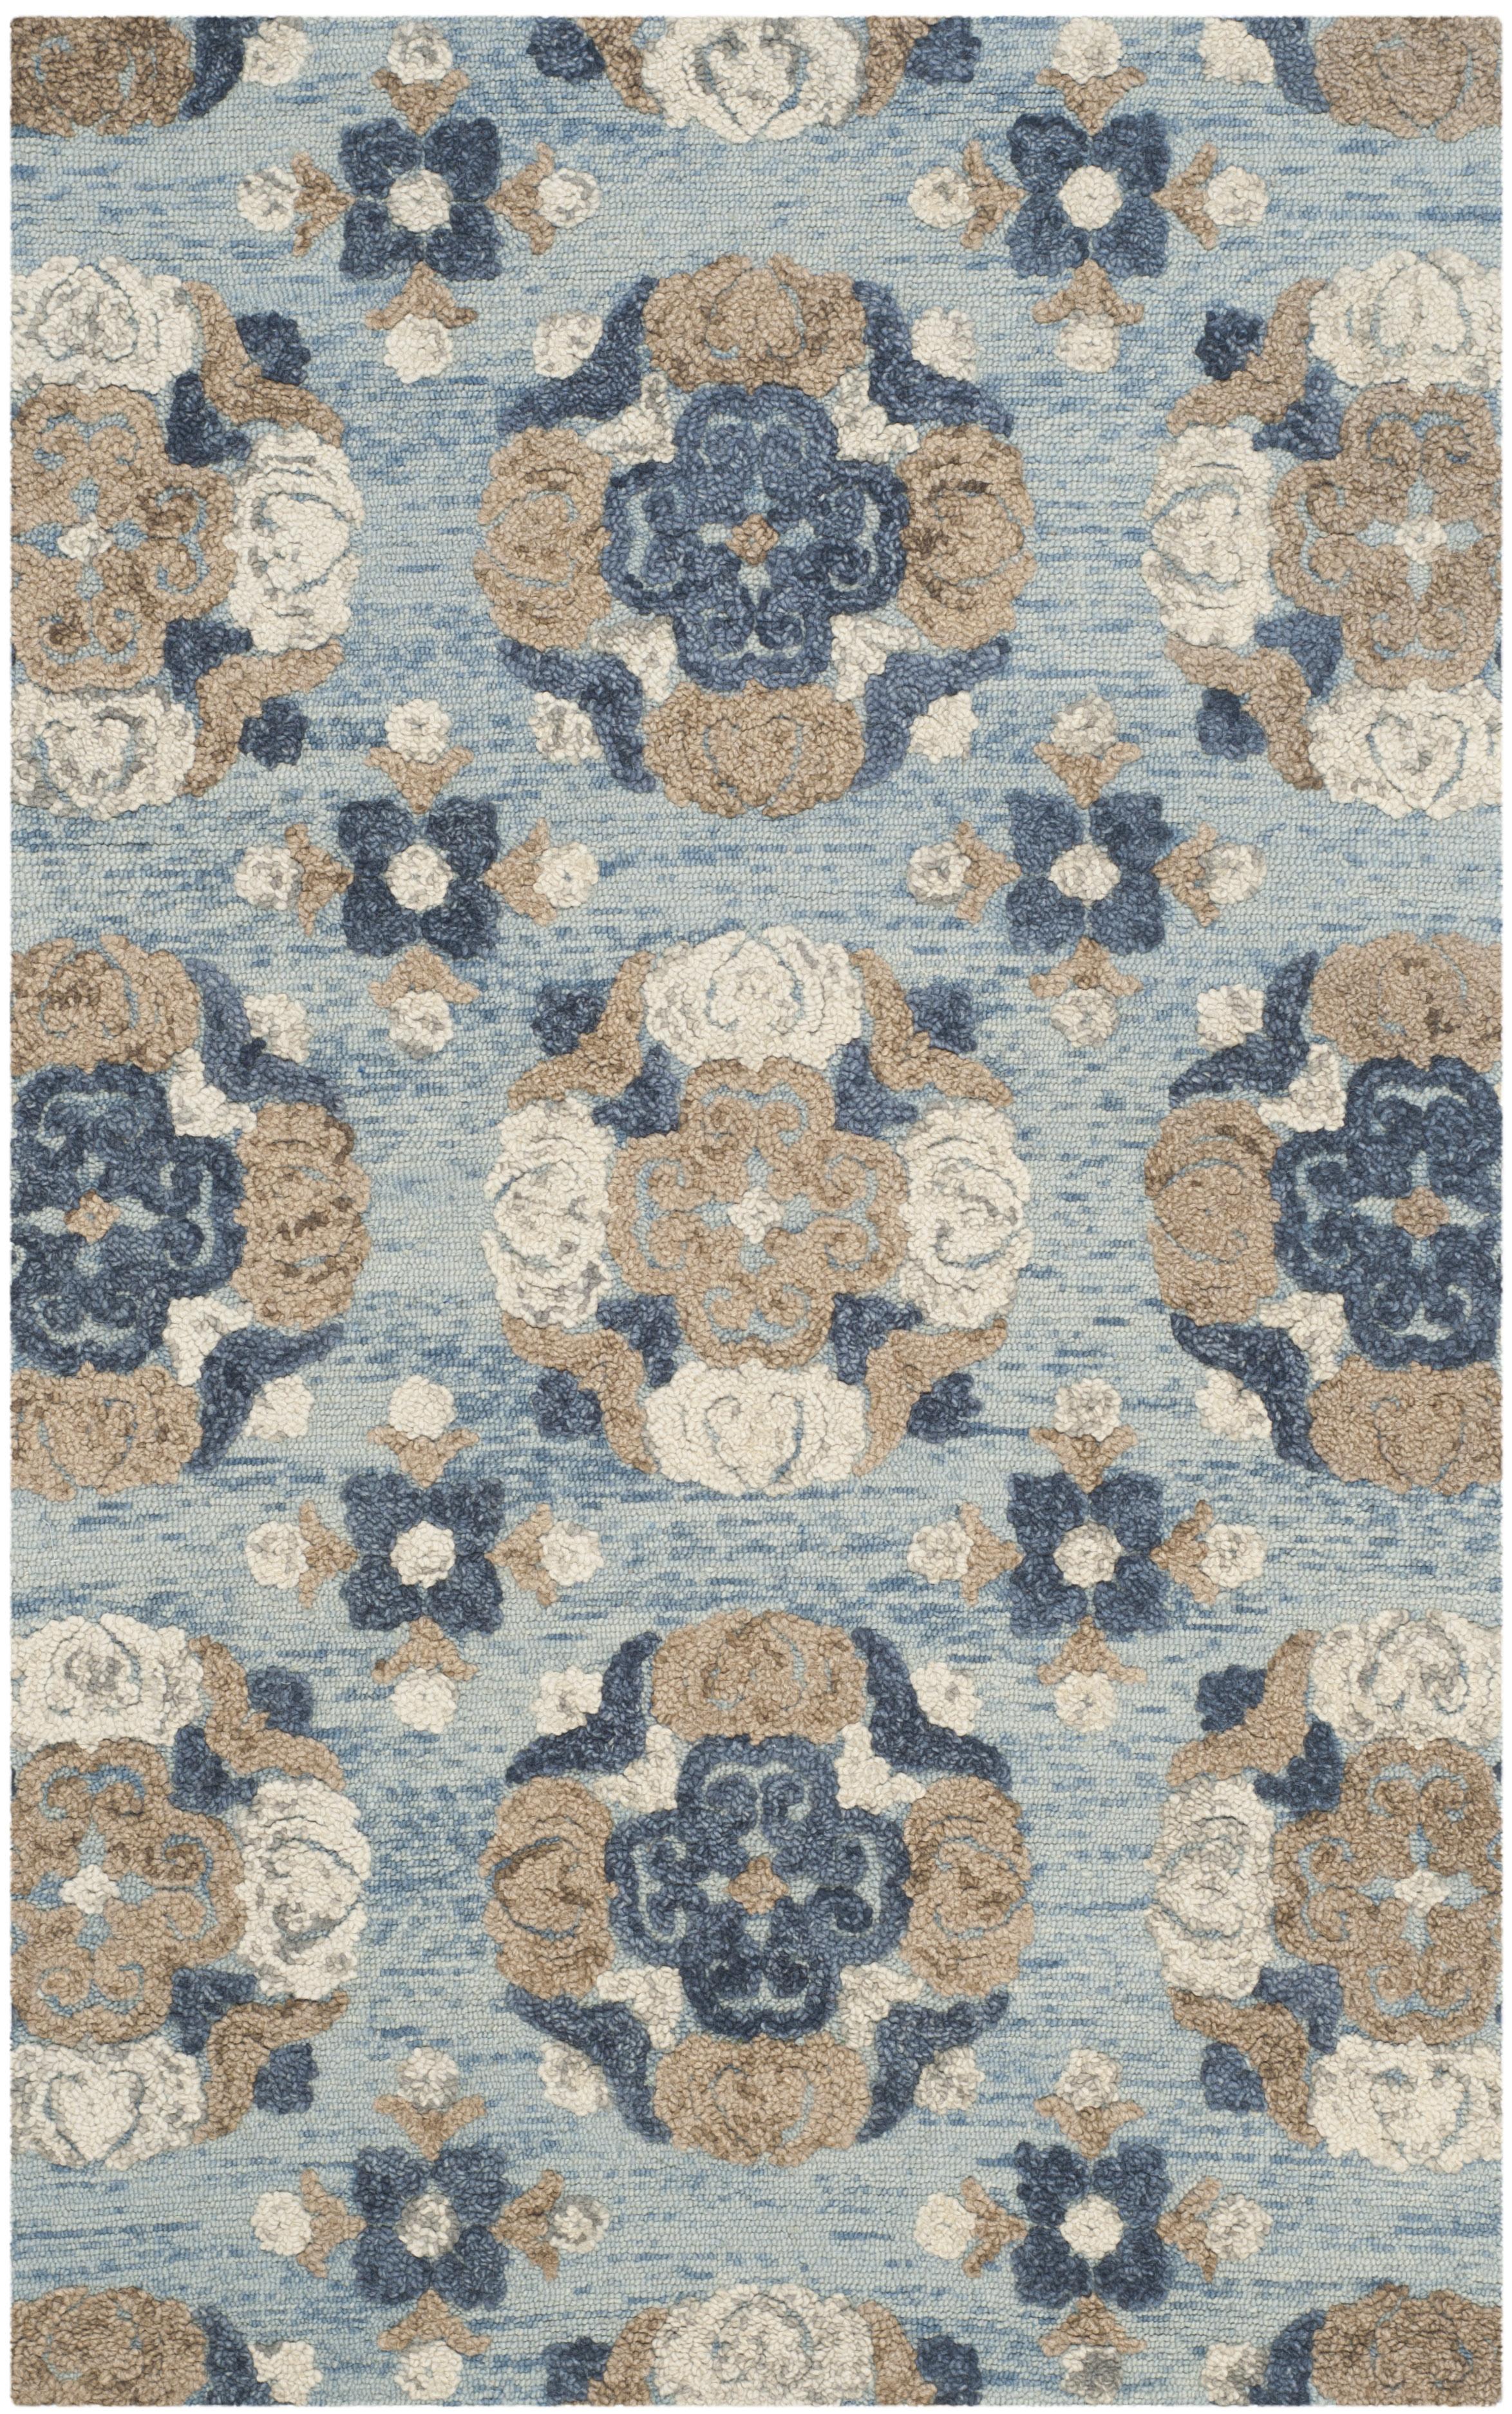 Morgan 403 5' X 8' Blue Wool Rug